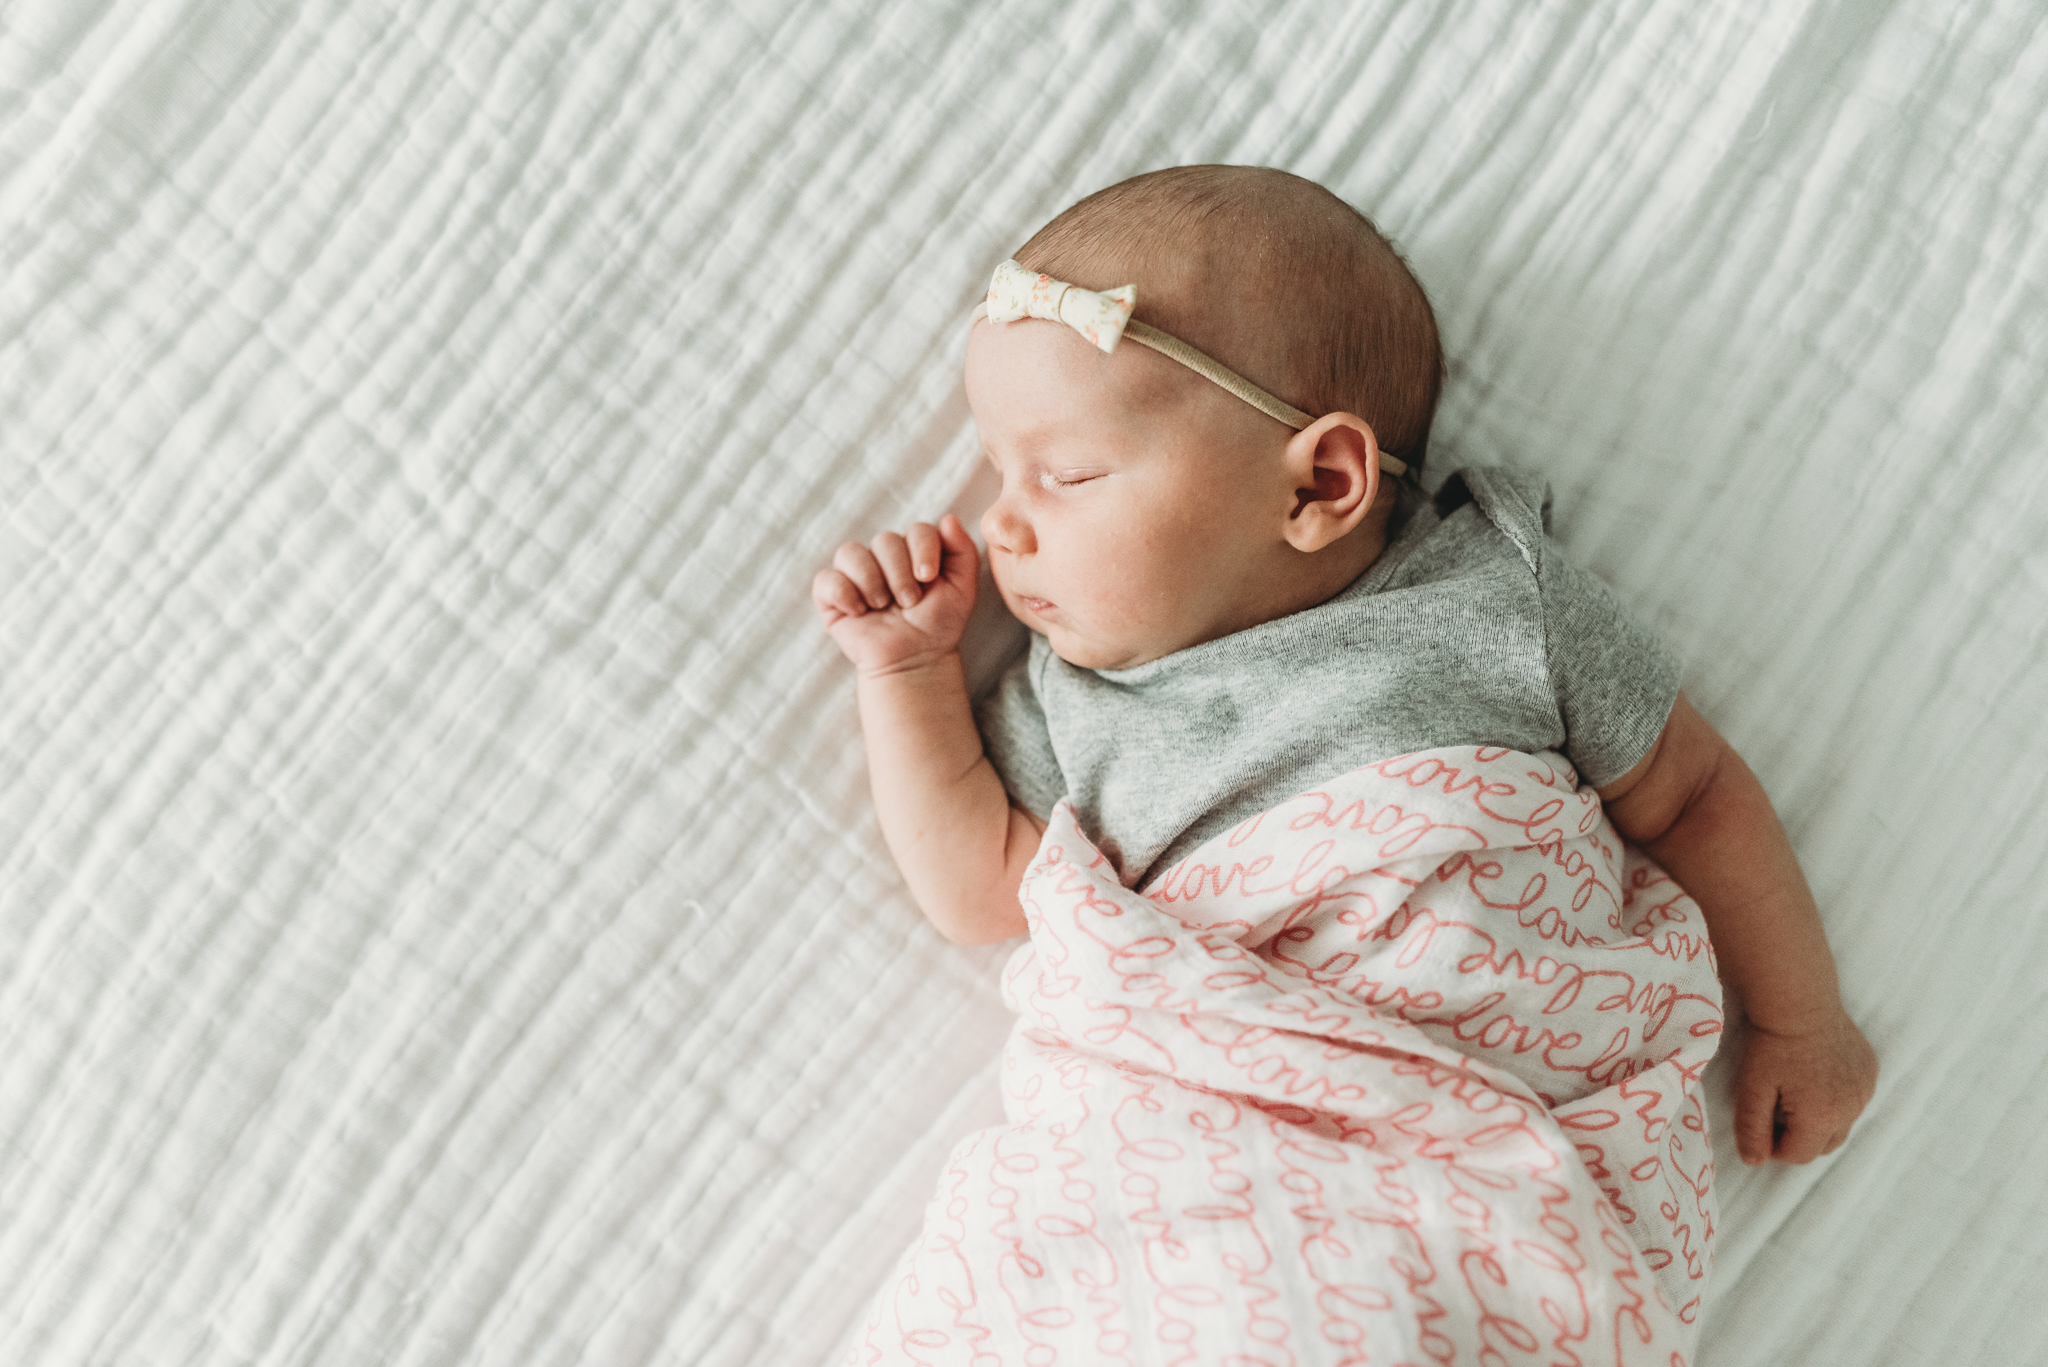 austin-lifestyle-newborn-photographer-8055.jpg